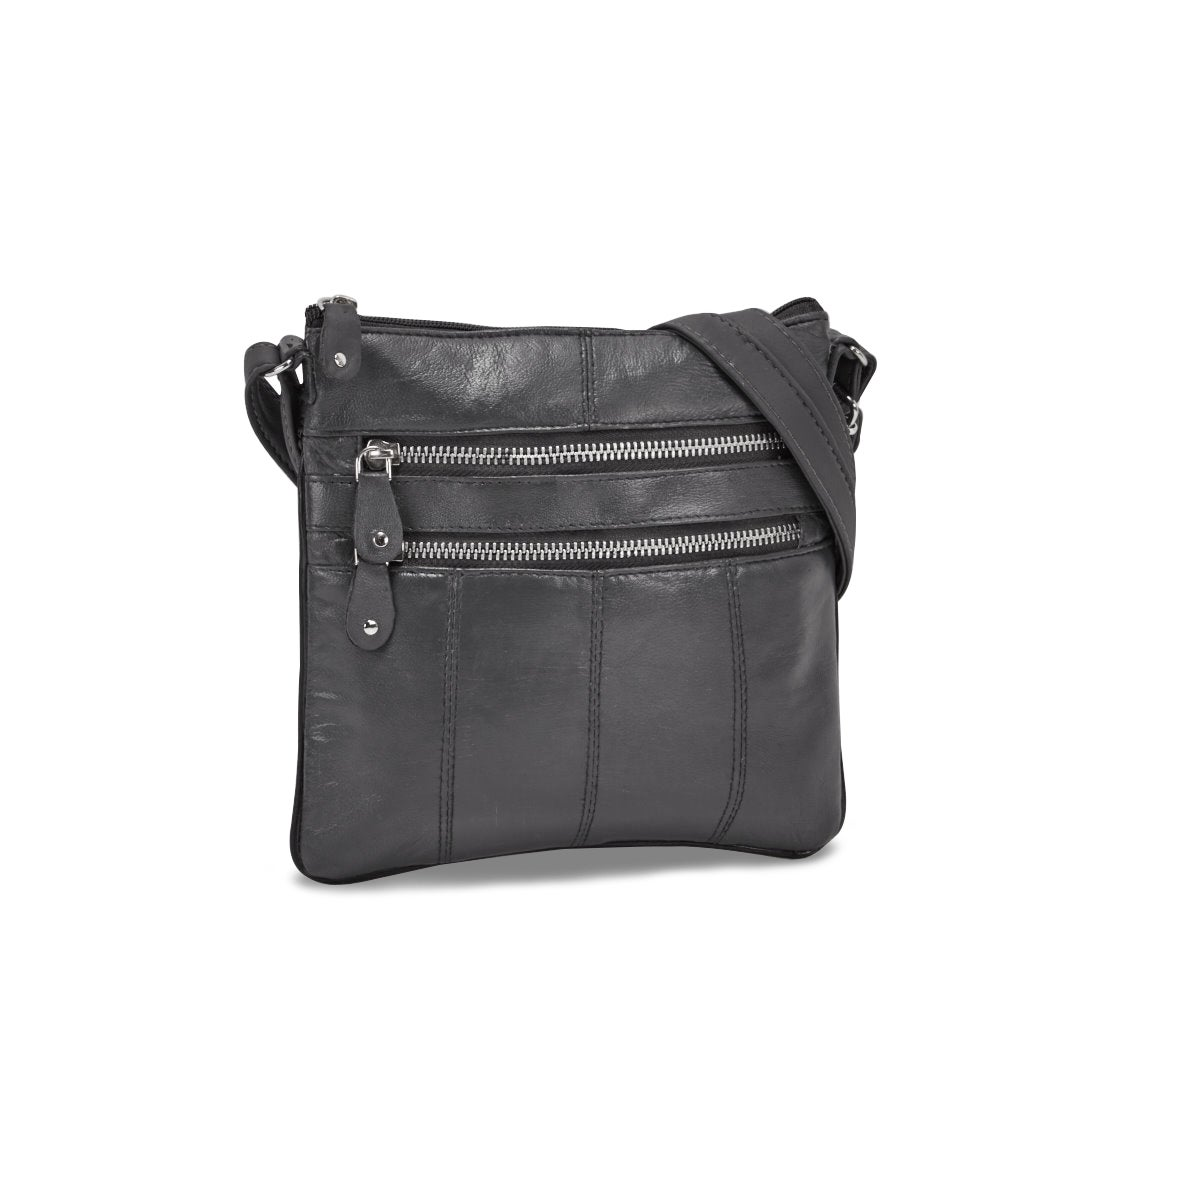 Women's grey sheep leather cross body bag